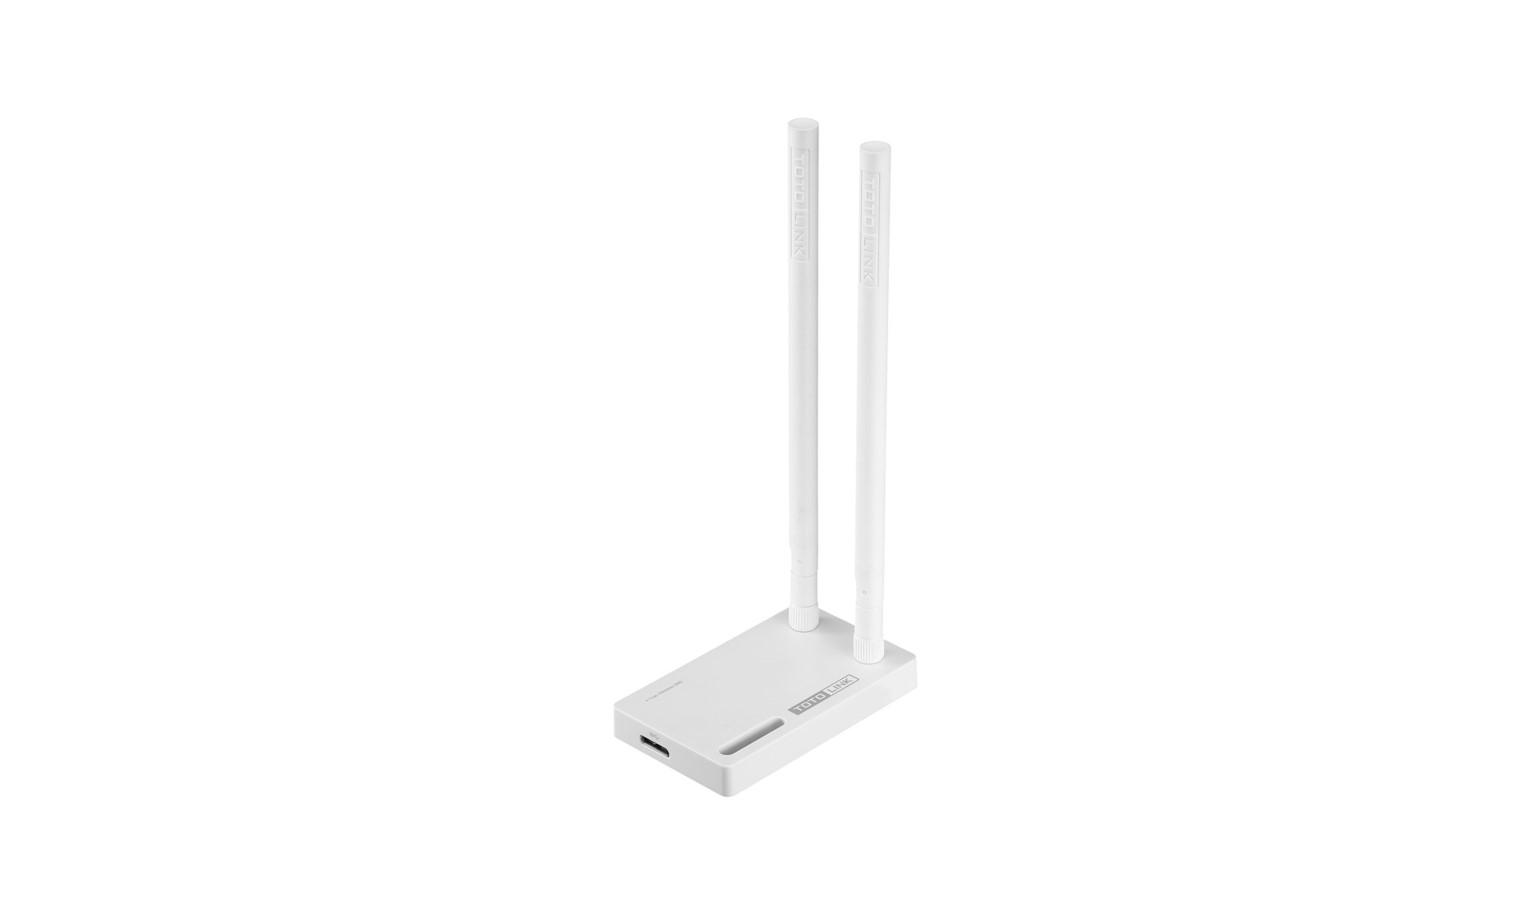 TOTOLINK A2000UA Wireless AC1200 USB 3.0 Adapter - White